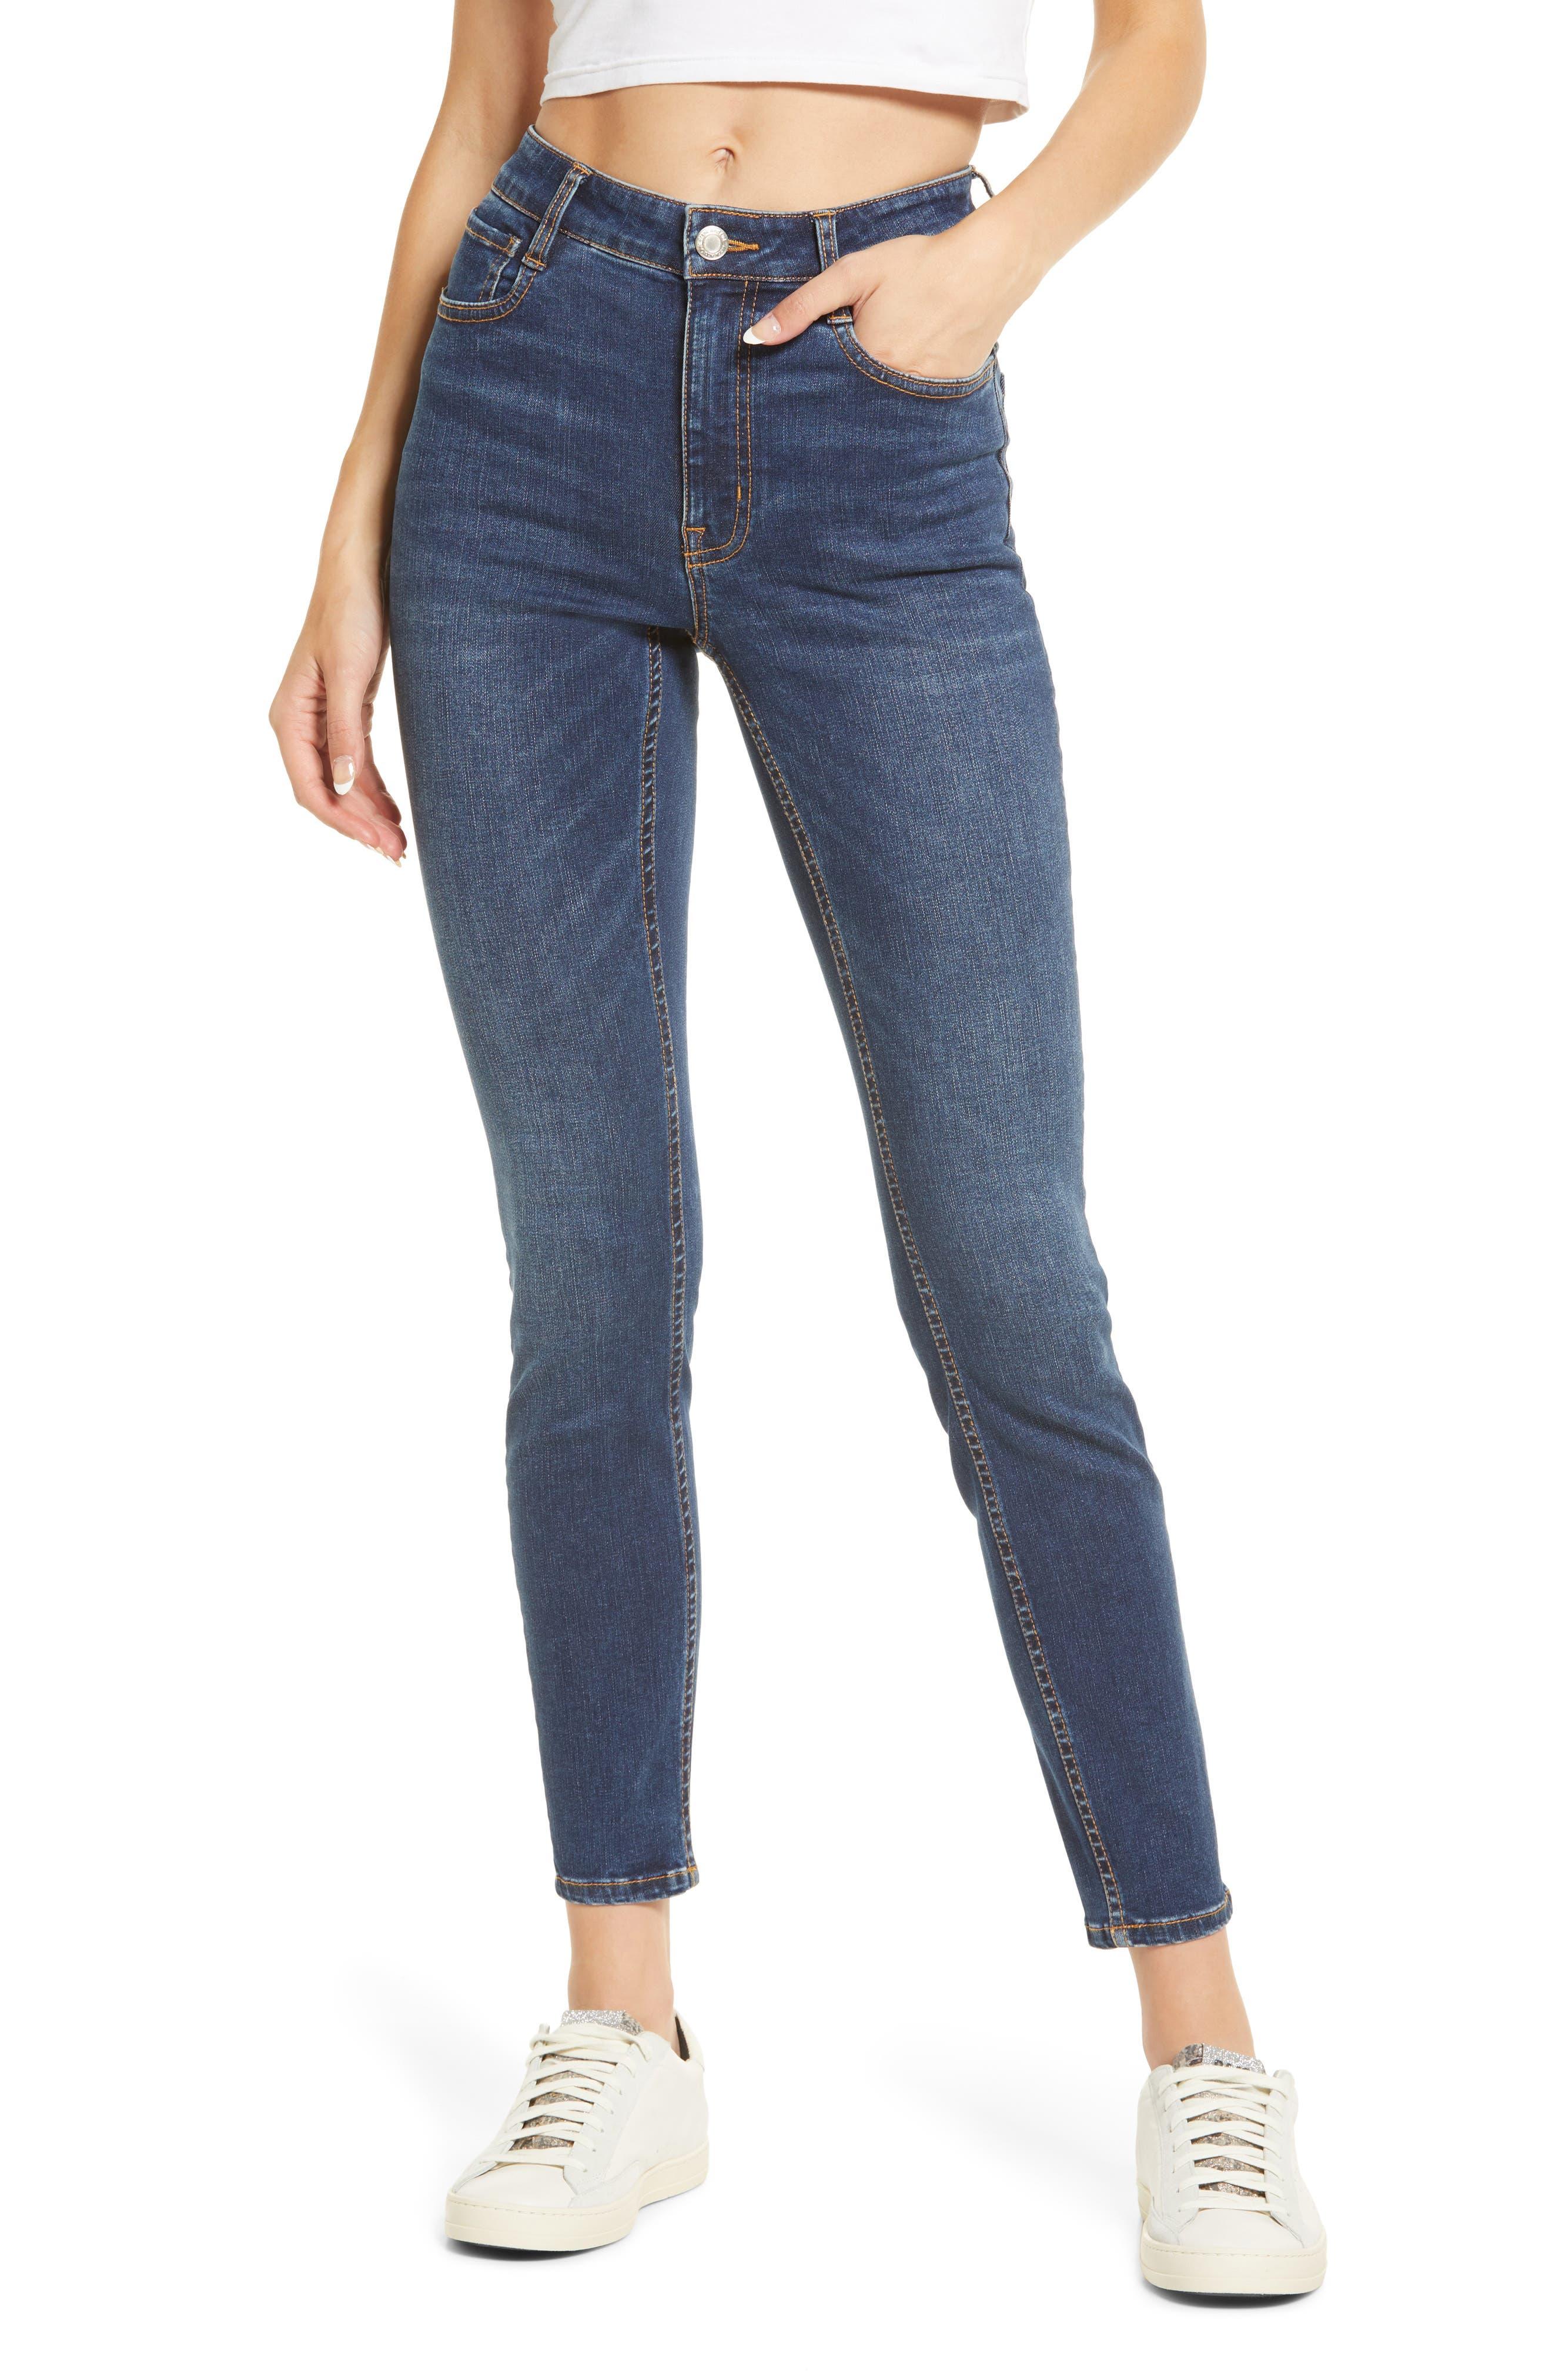 Debbie High Waist Ankle Skinny Jeans